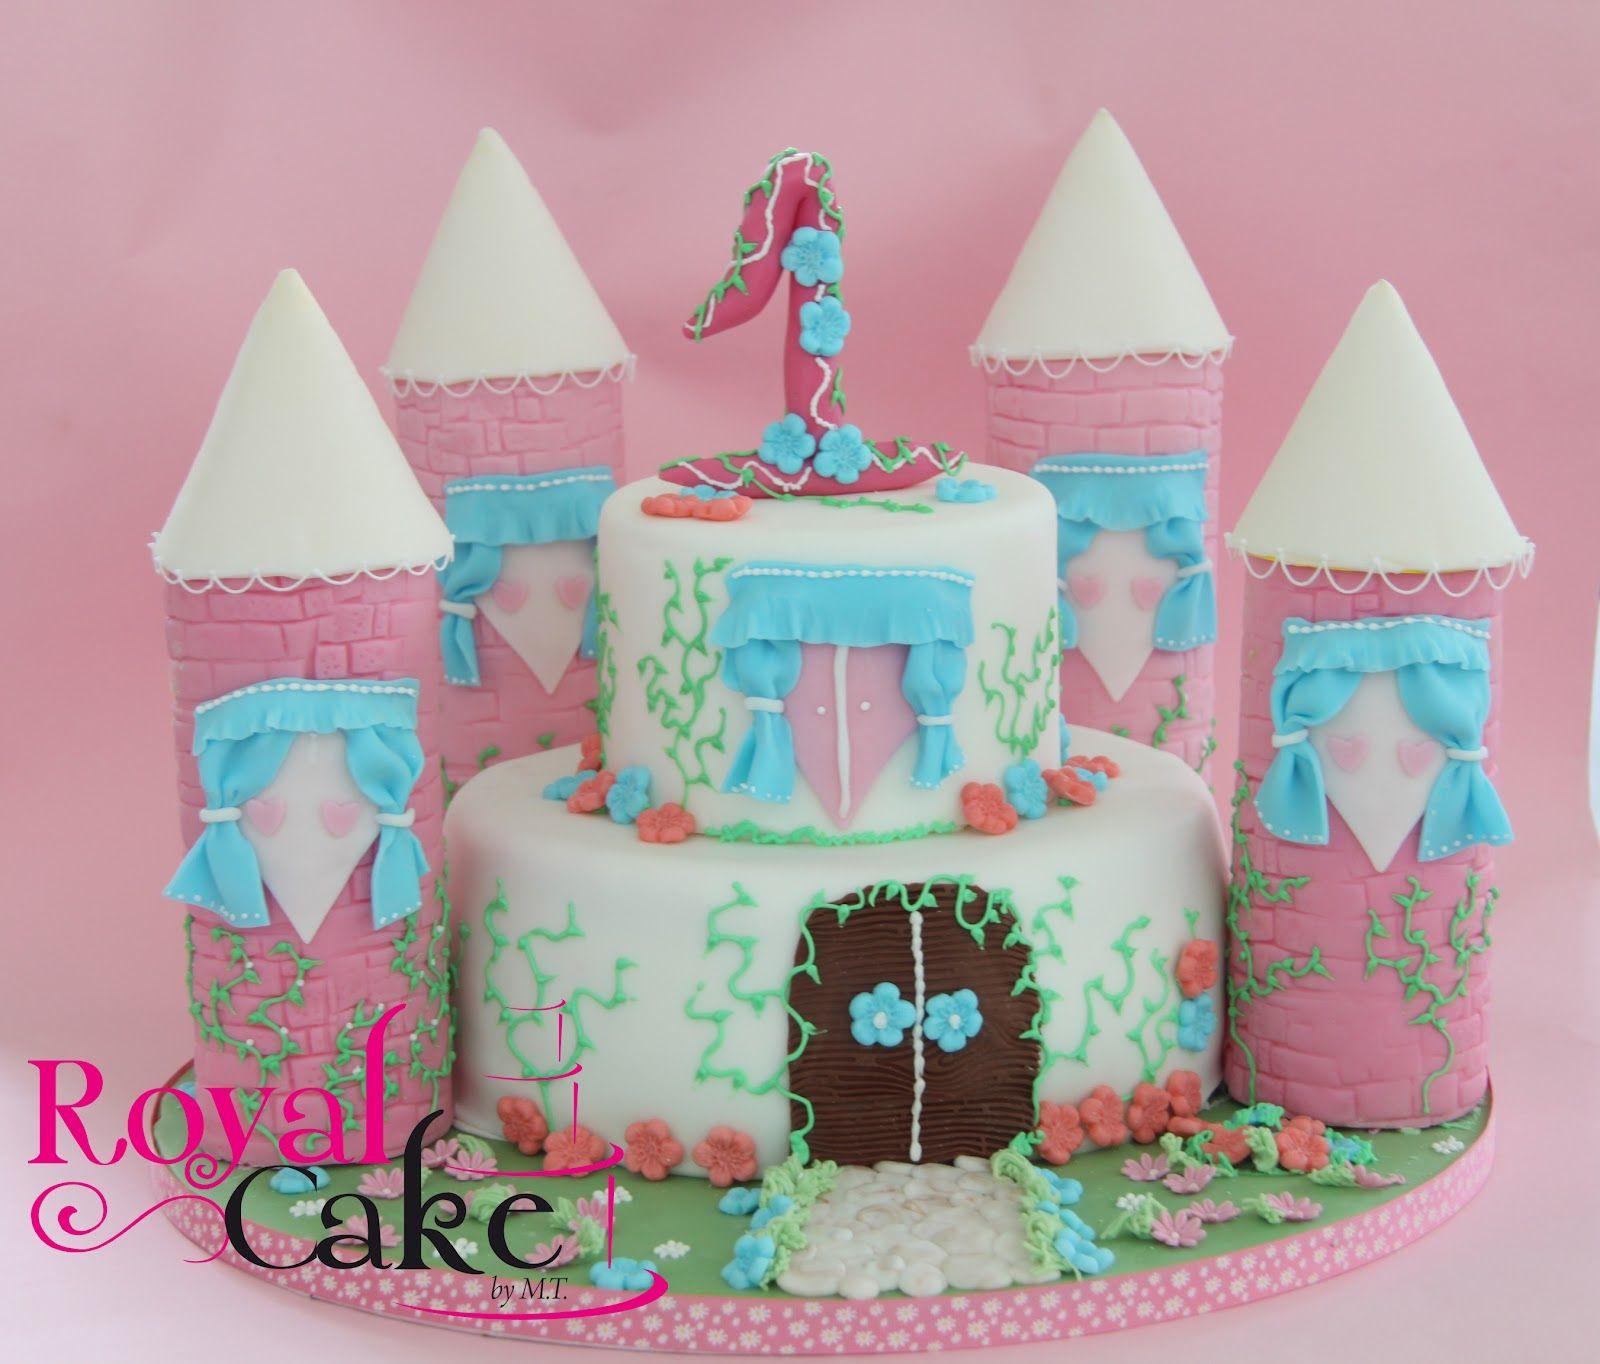 blunotte: CASTLE PRICESS CAKE